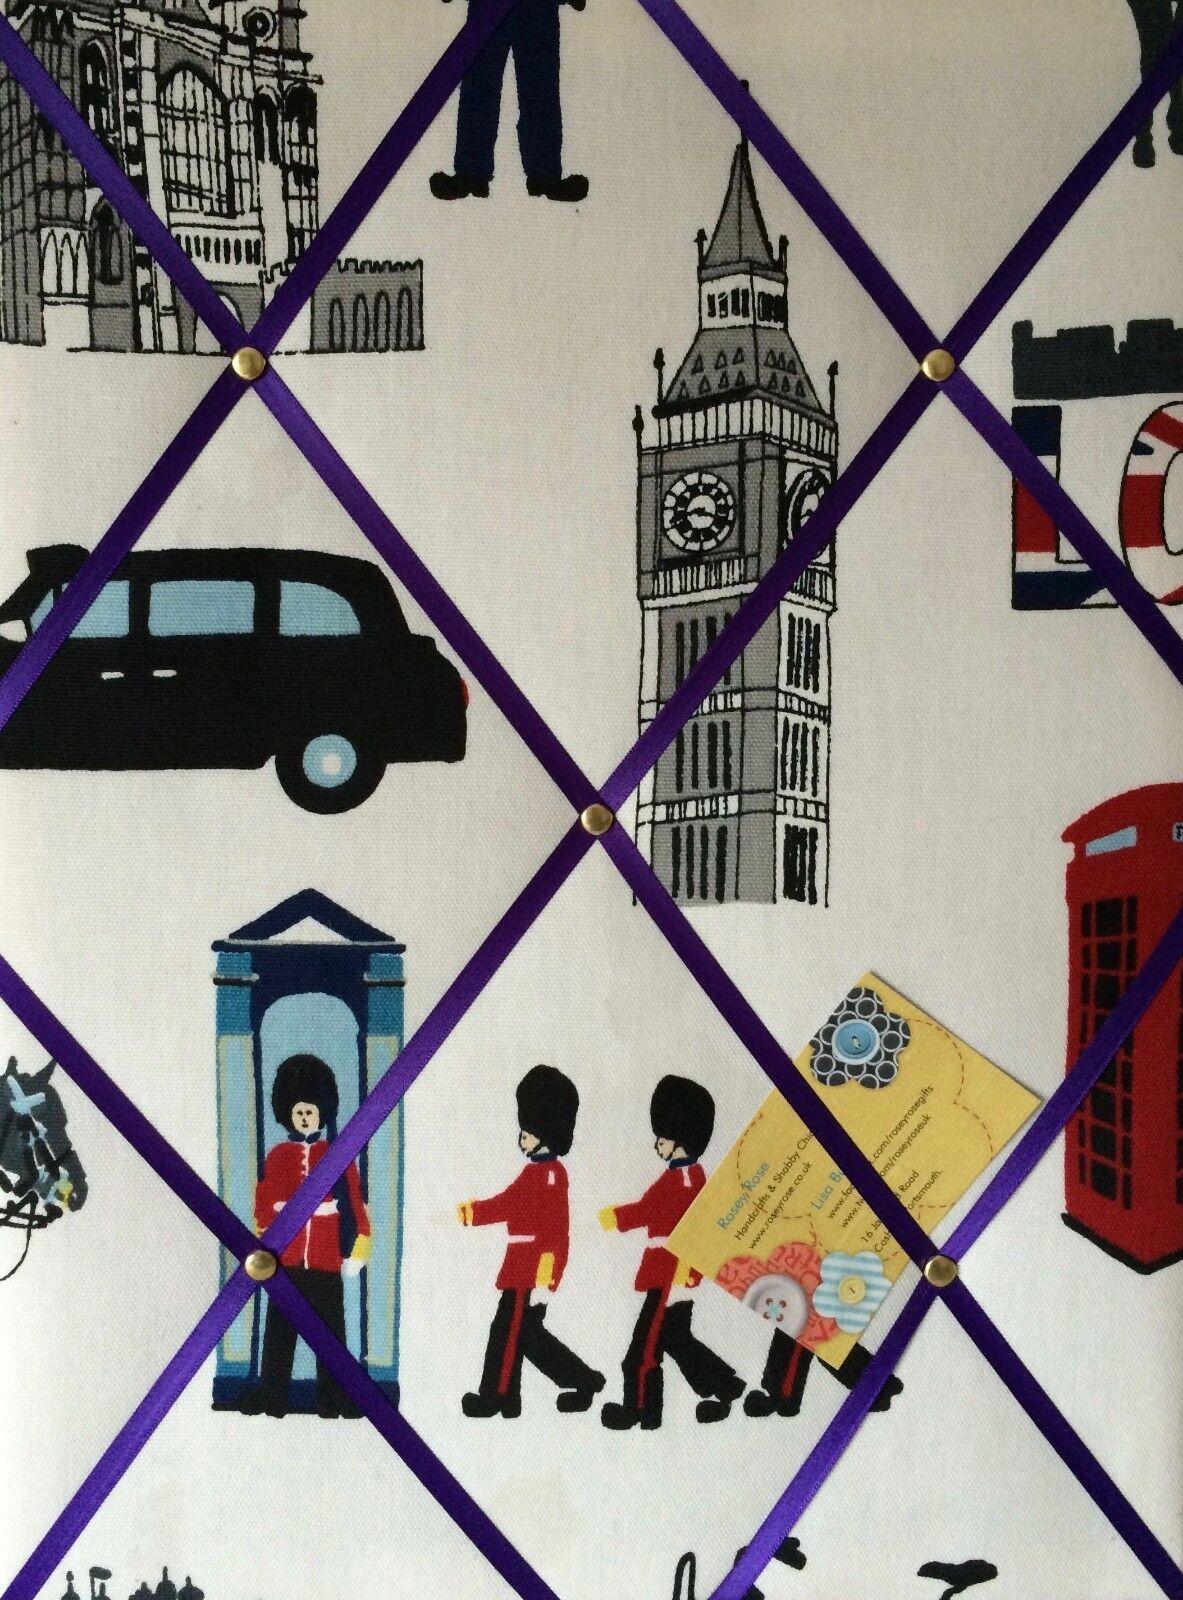 Prestigious London Capital City lila Ribbon Crafted Fabric Notice Pin Board